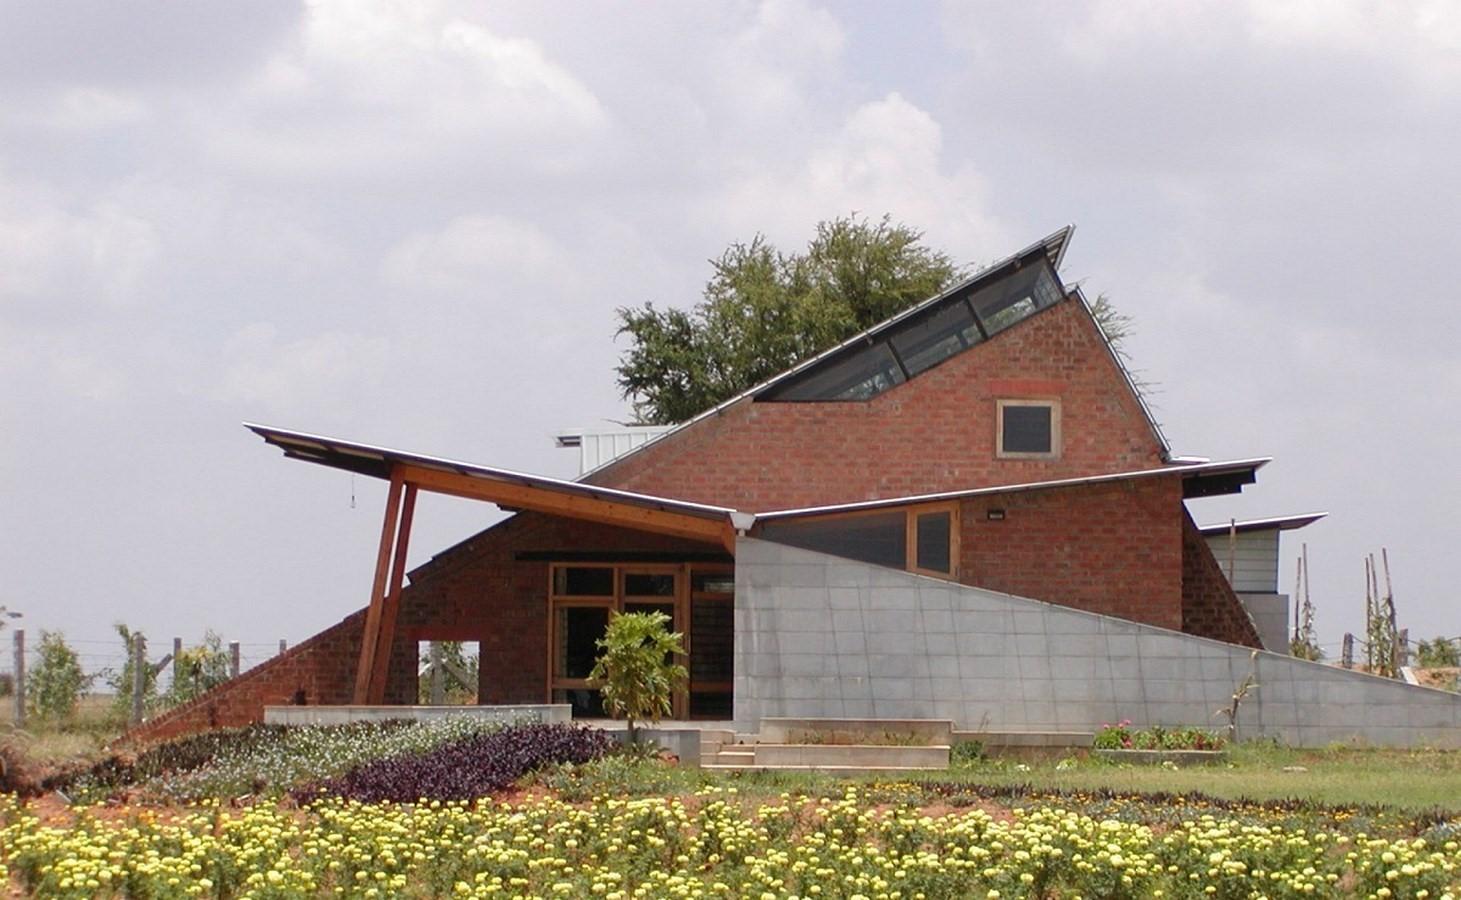 House Triangle Farmhouse - Sheet2